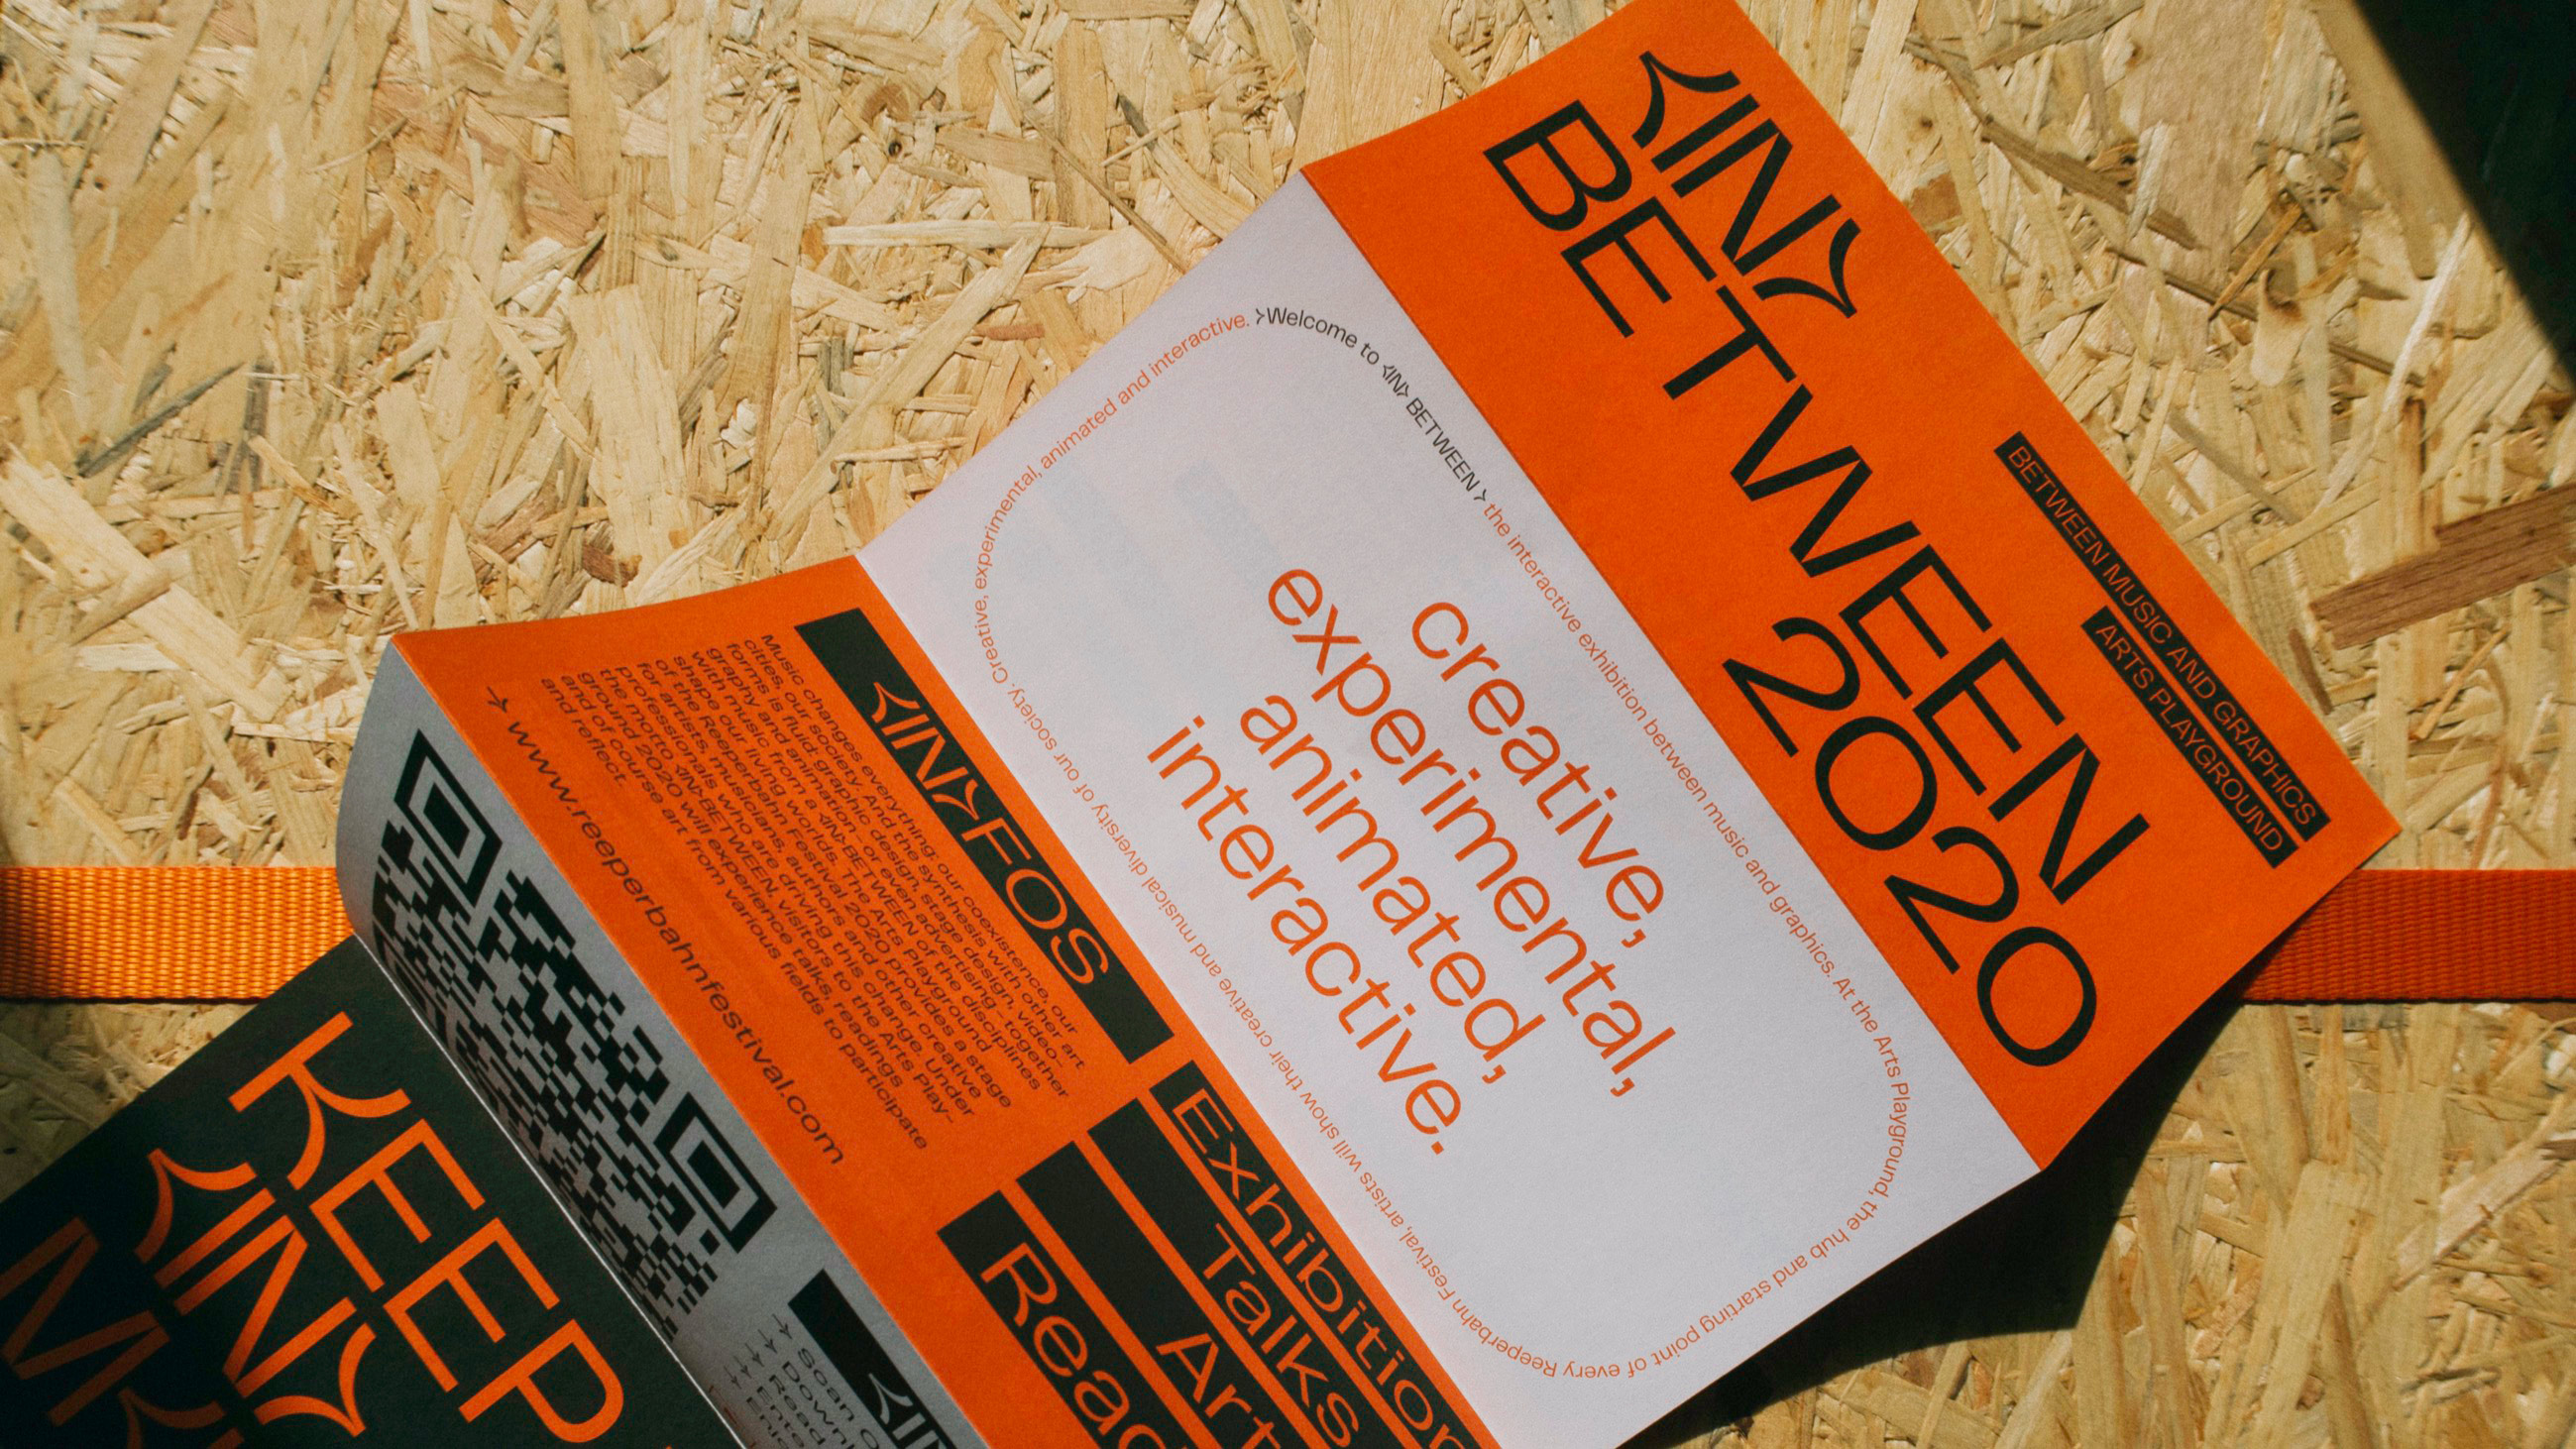 gedrucktes Programmheft zum reeperbahn festival in hamburg